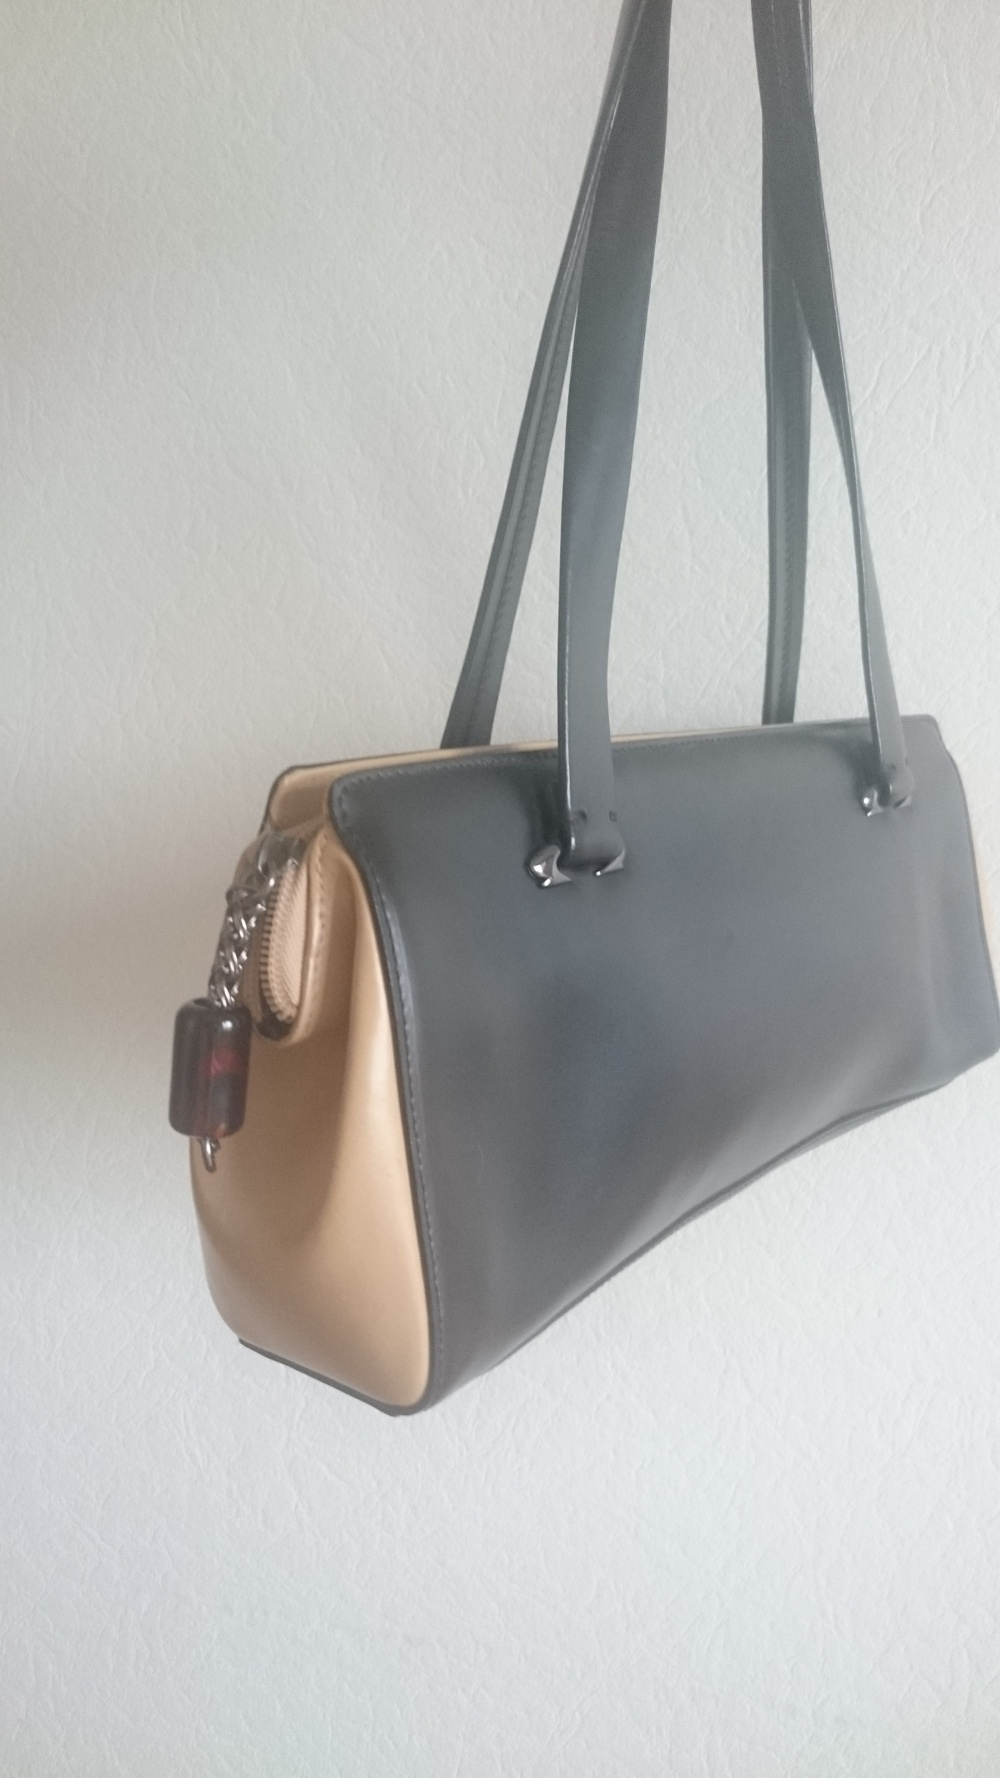 Маленькая сумочка Wanlima, размер 31х14х7см длина ручек 26см